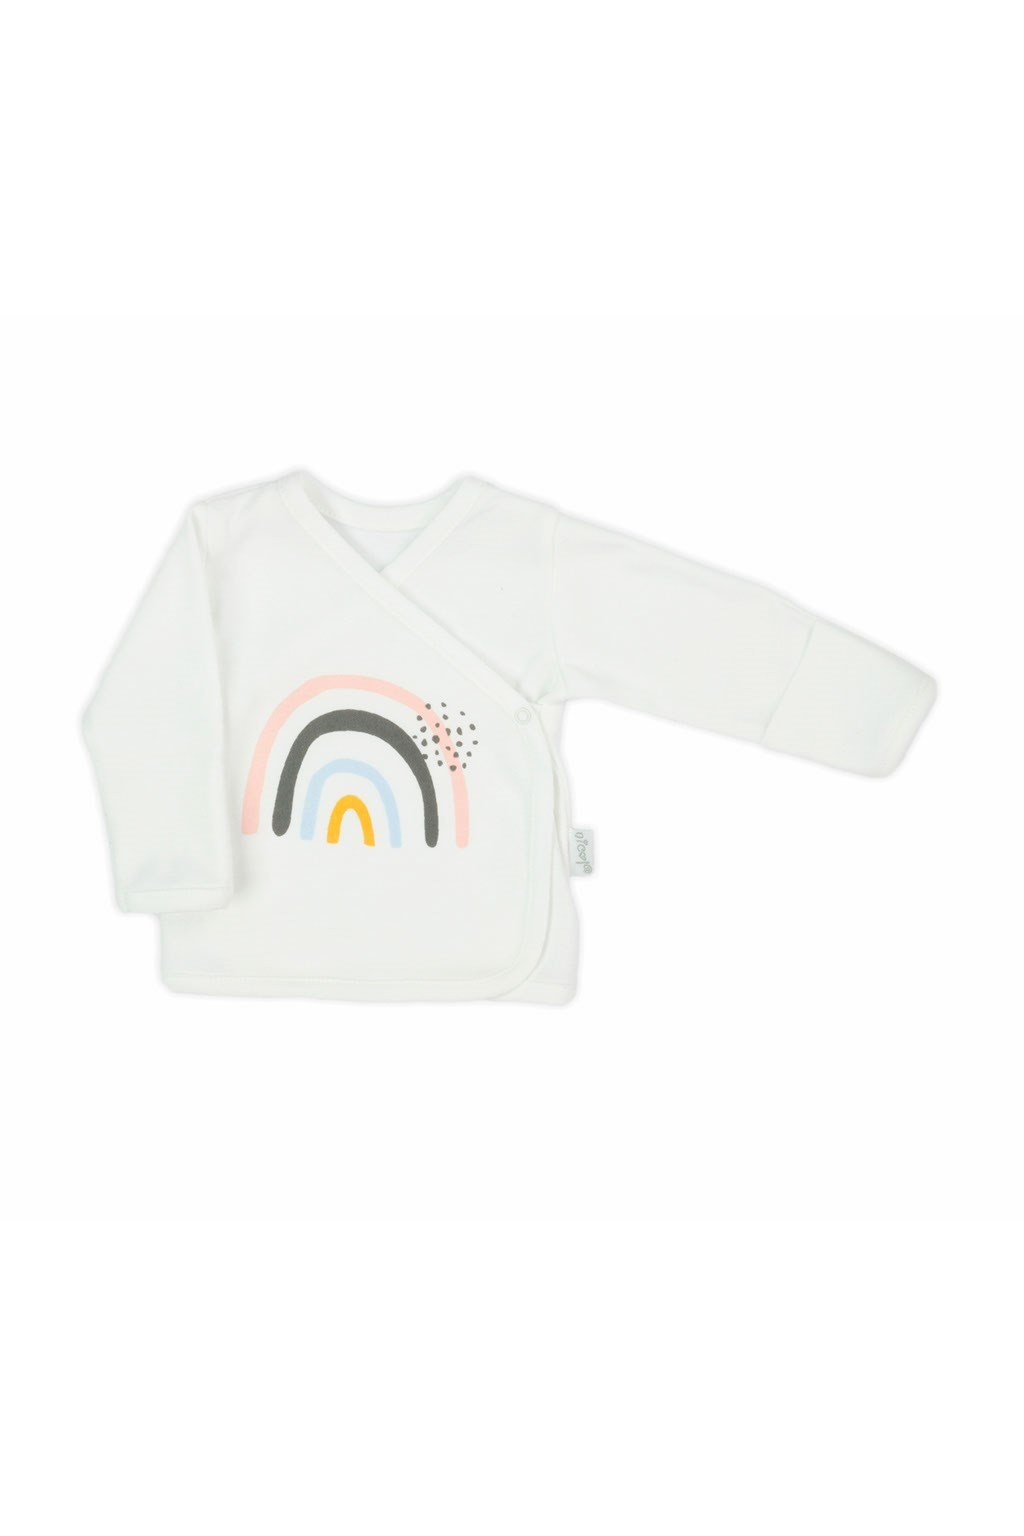 Dojčenská bavlněná košilka Nicol Rainbow